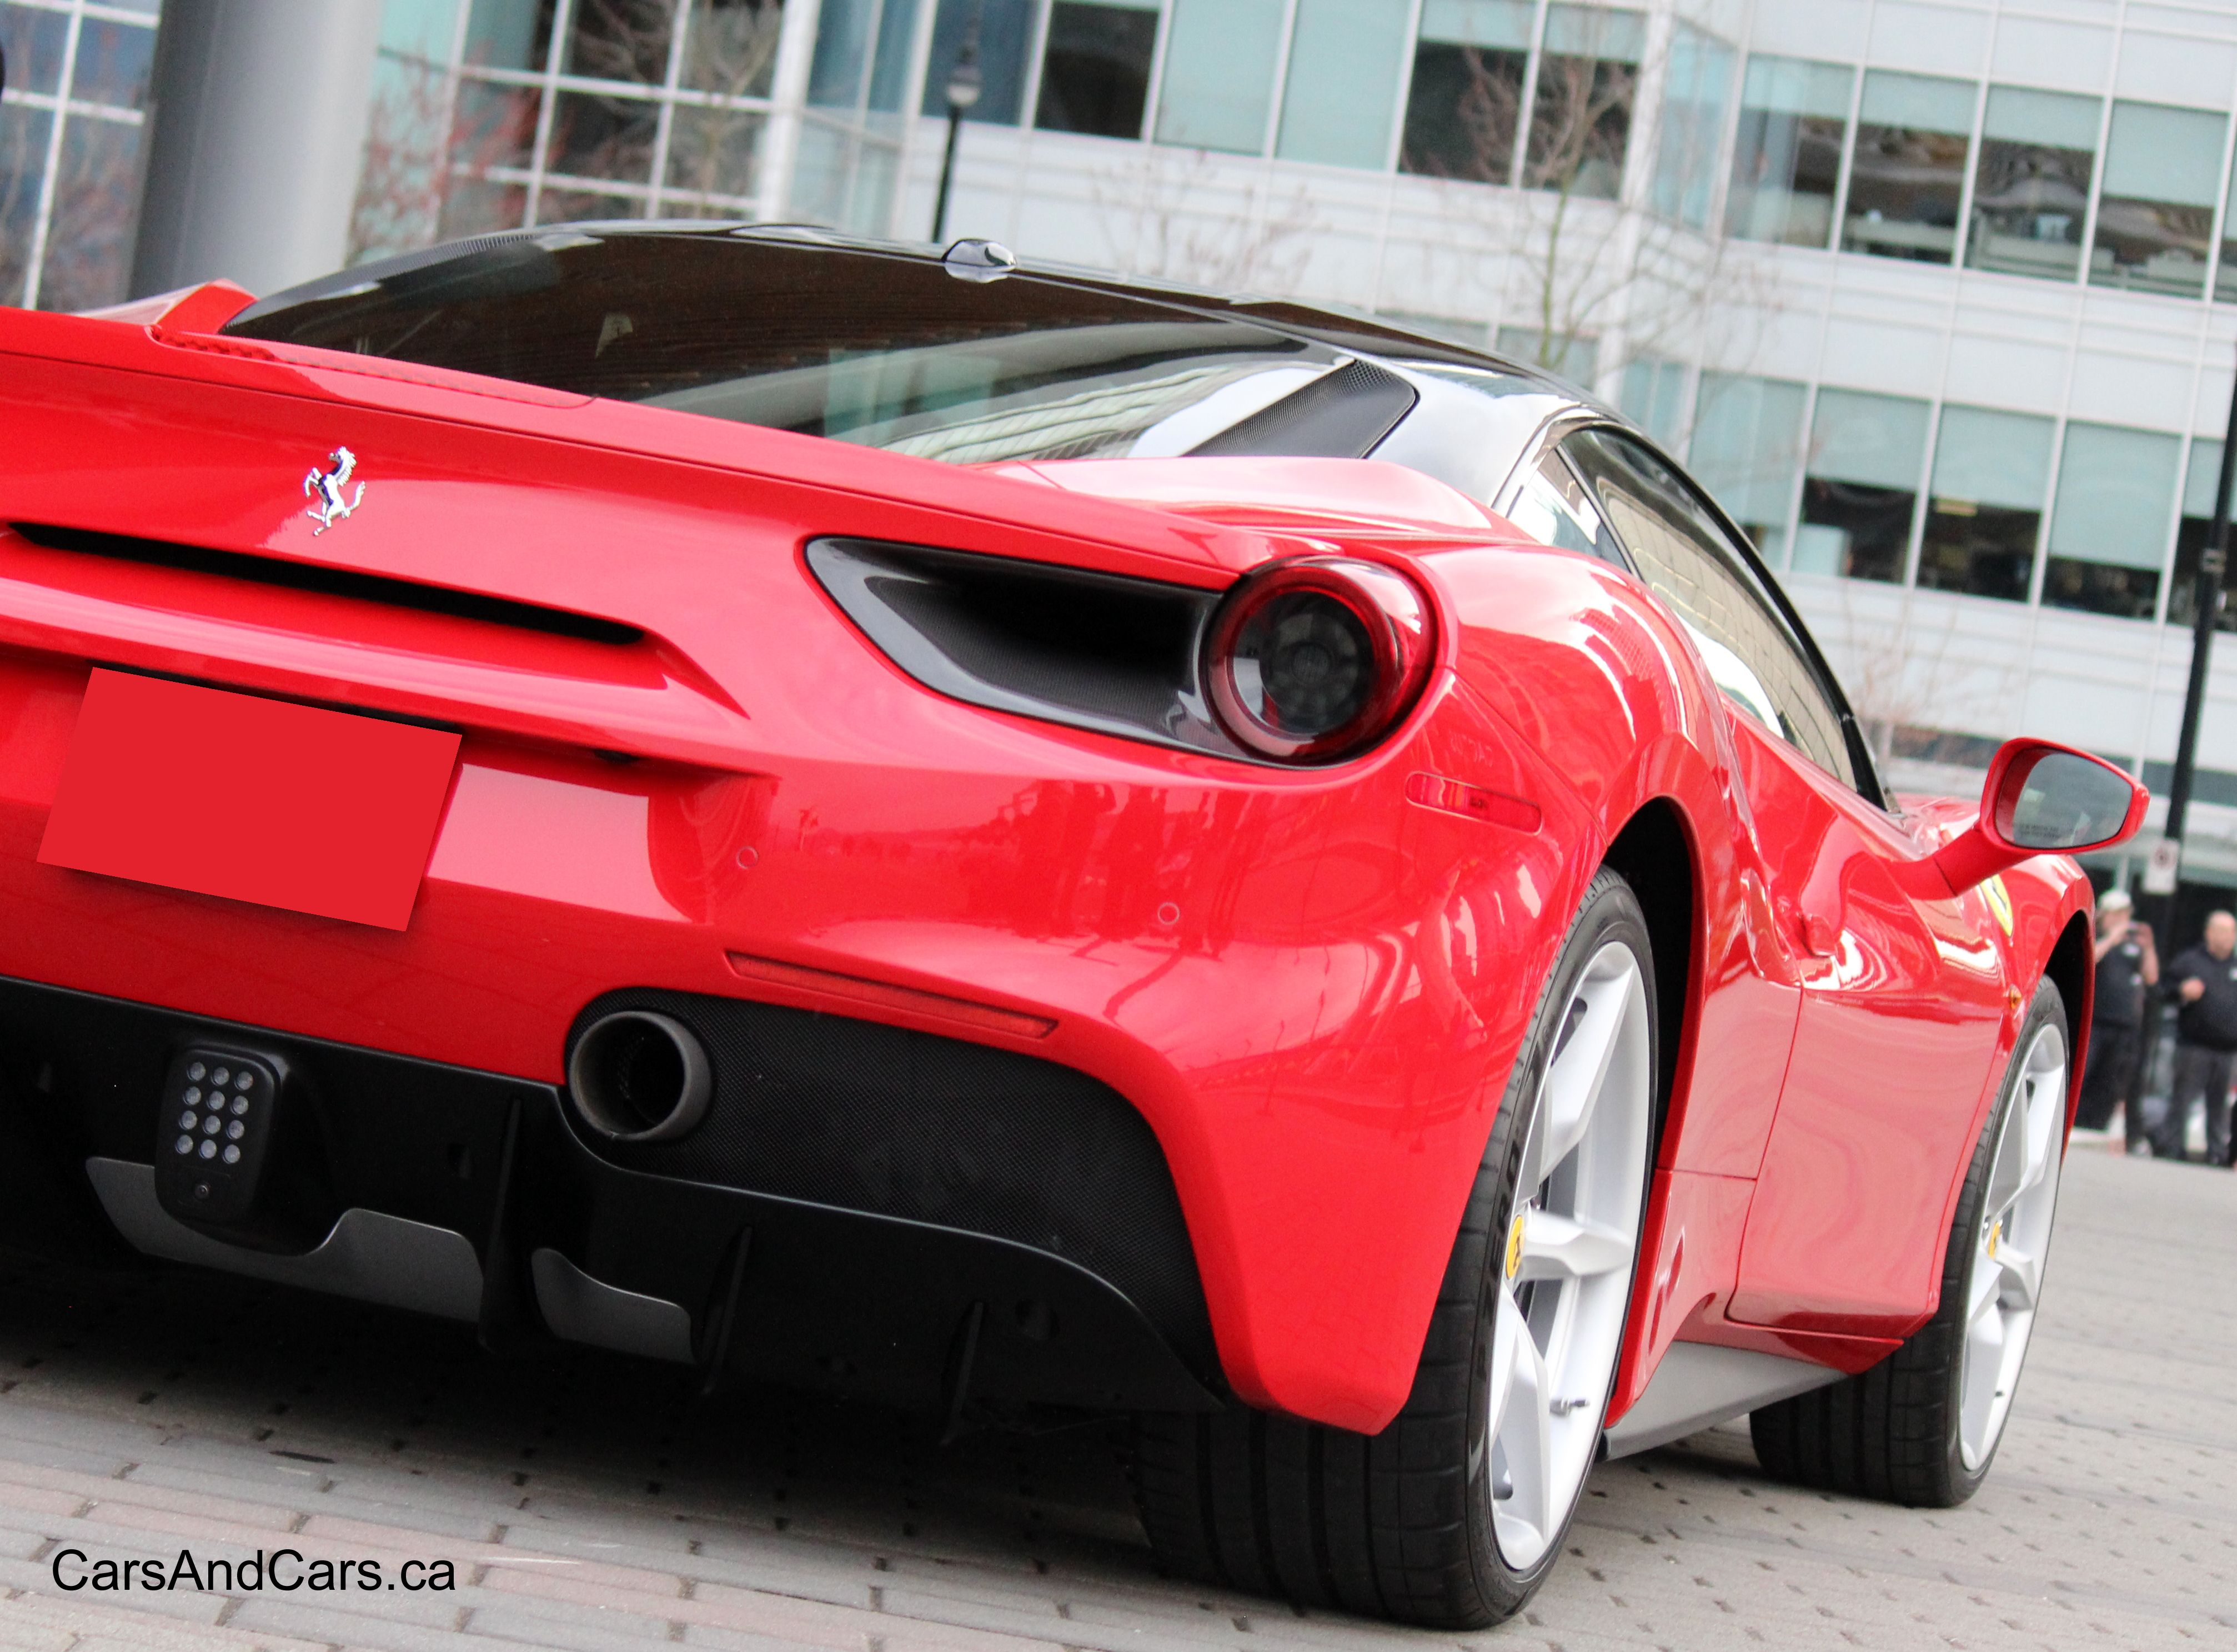 Ferrari 488 Gtb Ferrari 488 Dream Cars Cars For Sale